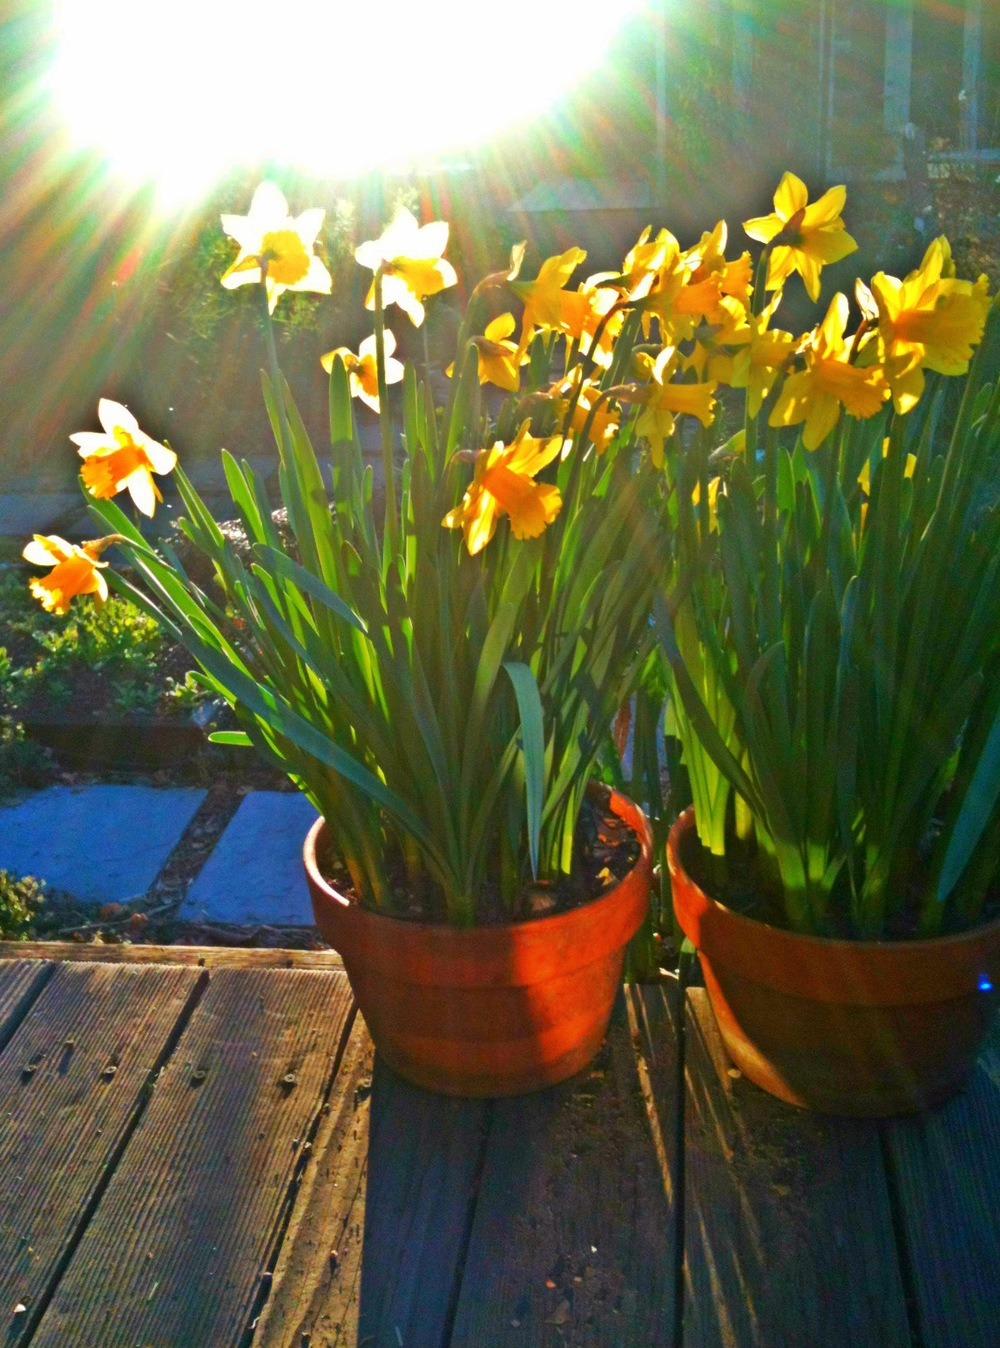 daffodils_pots.JPG